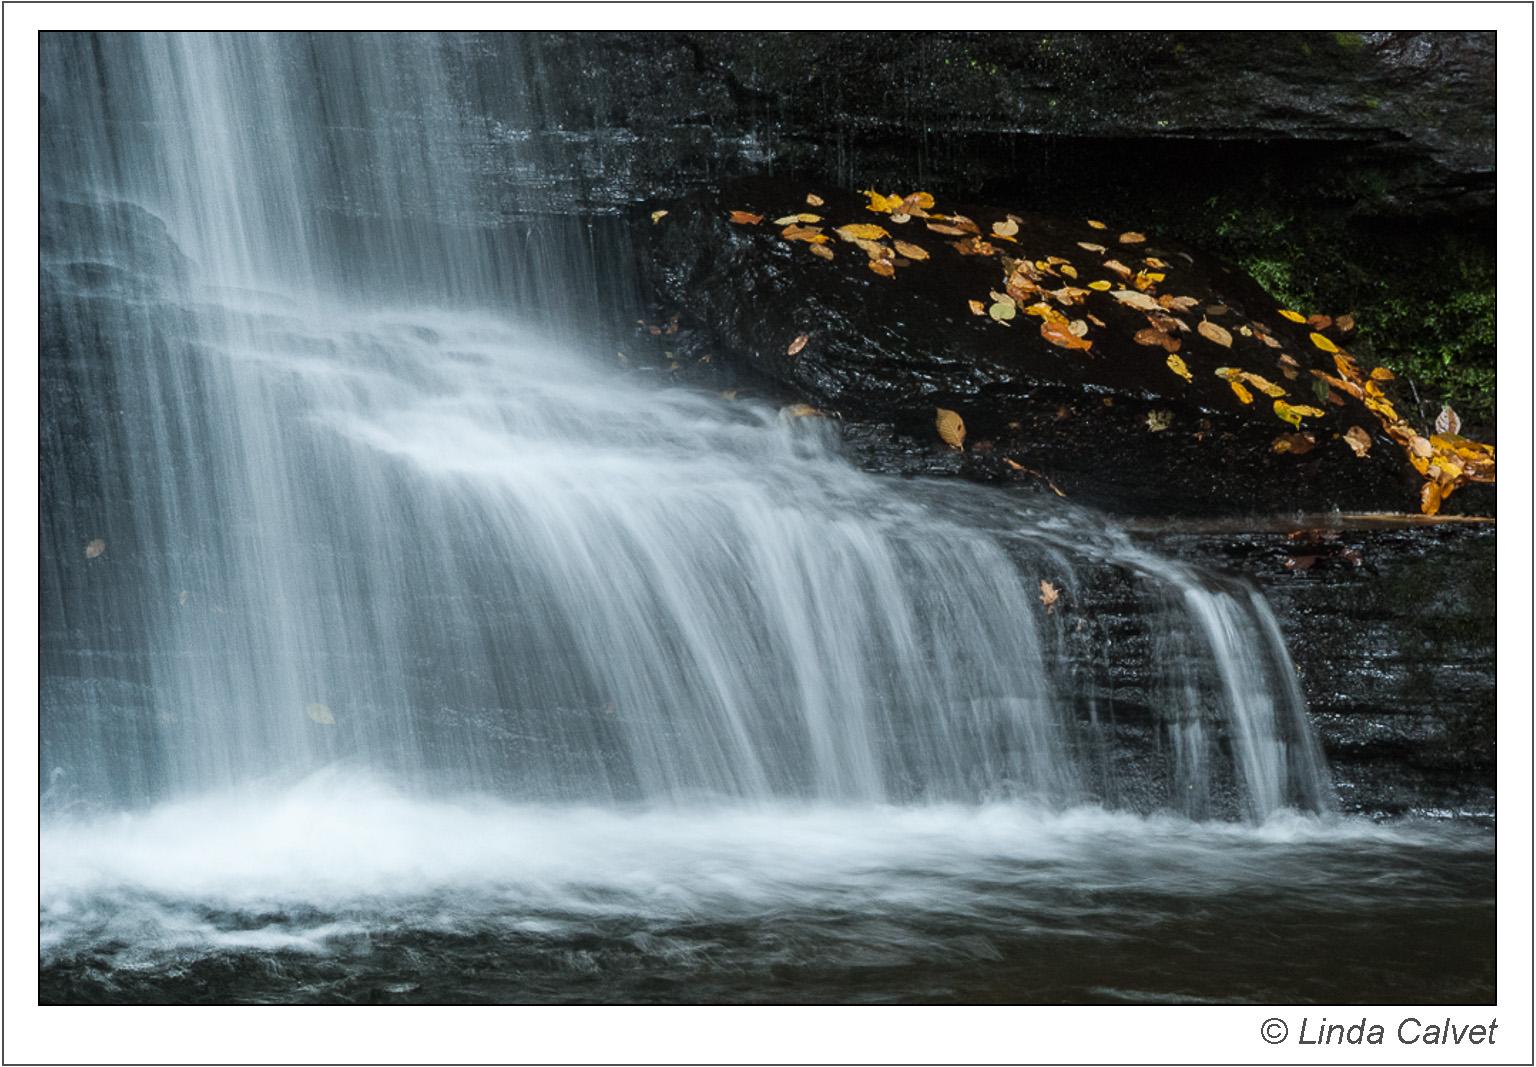 Close up detail of Bridal Veil Falls